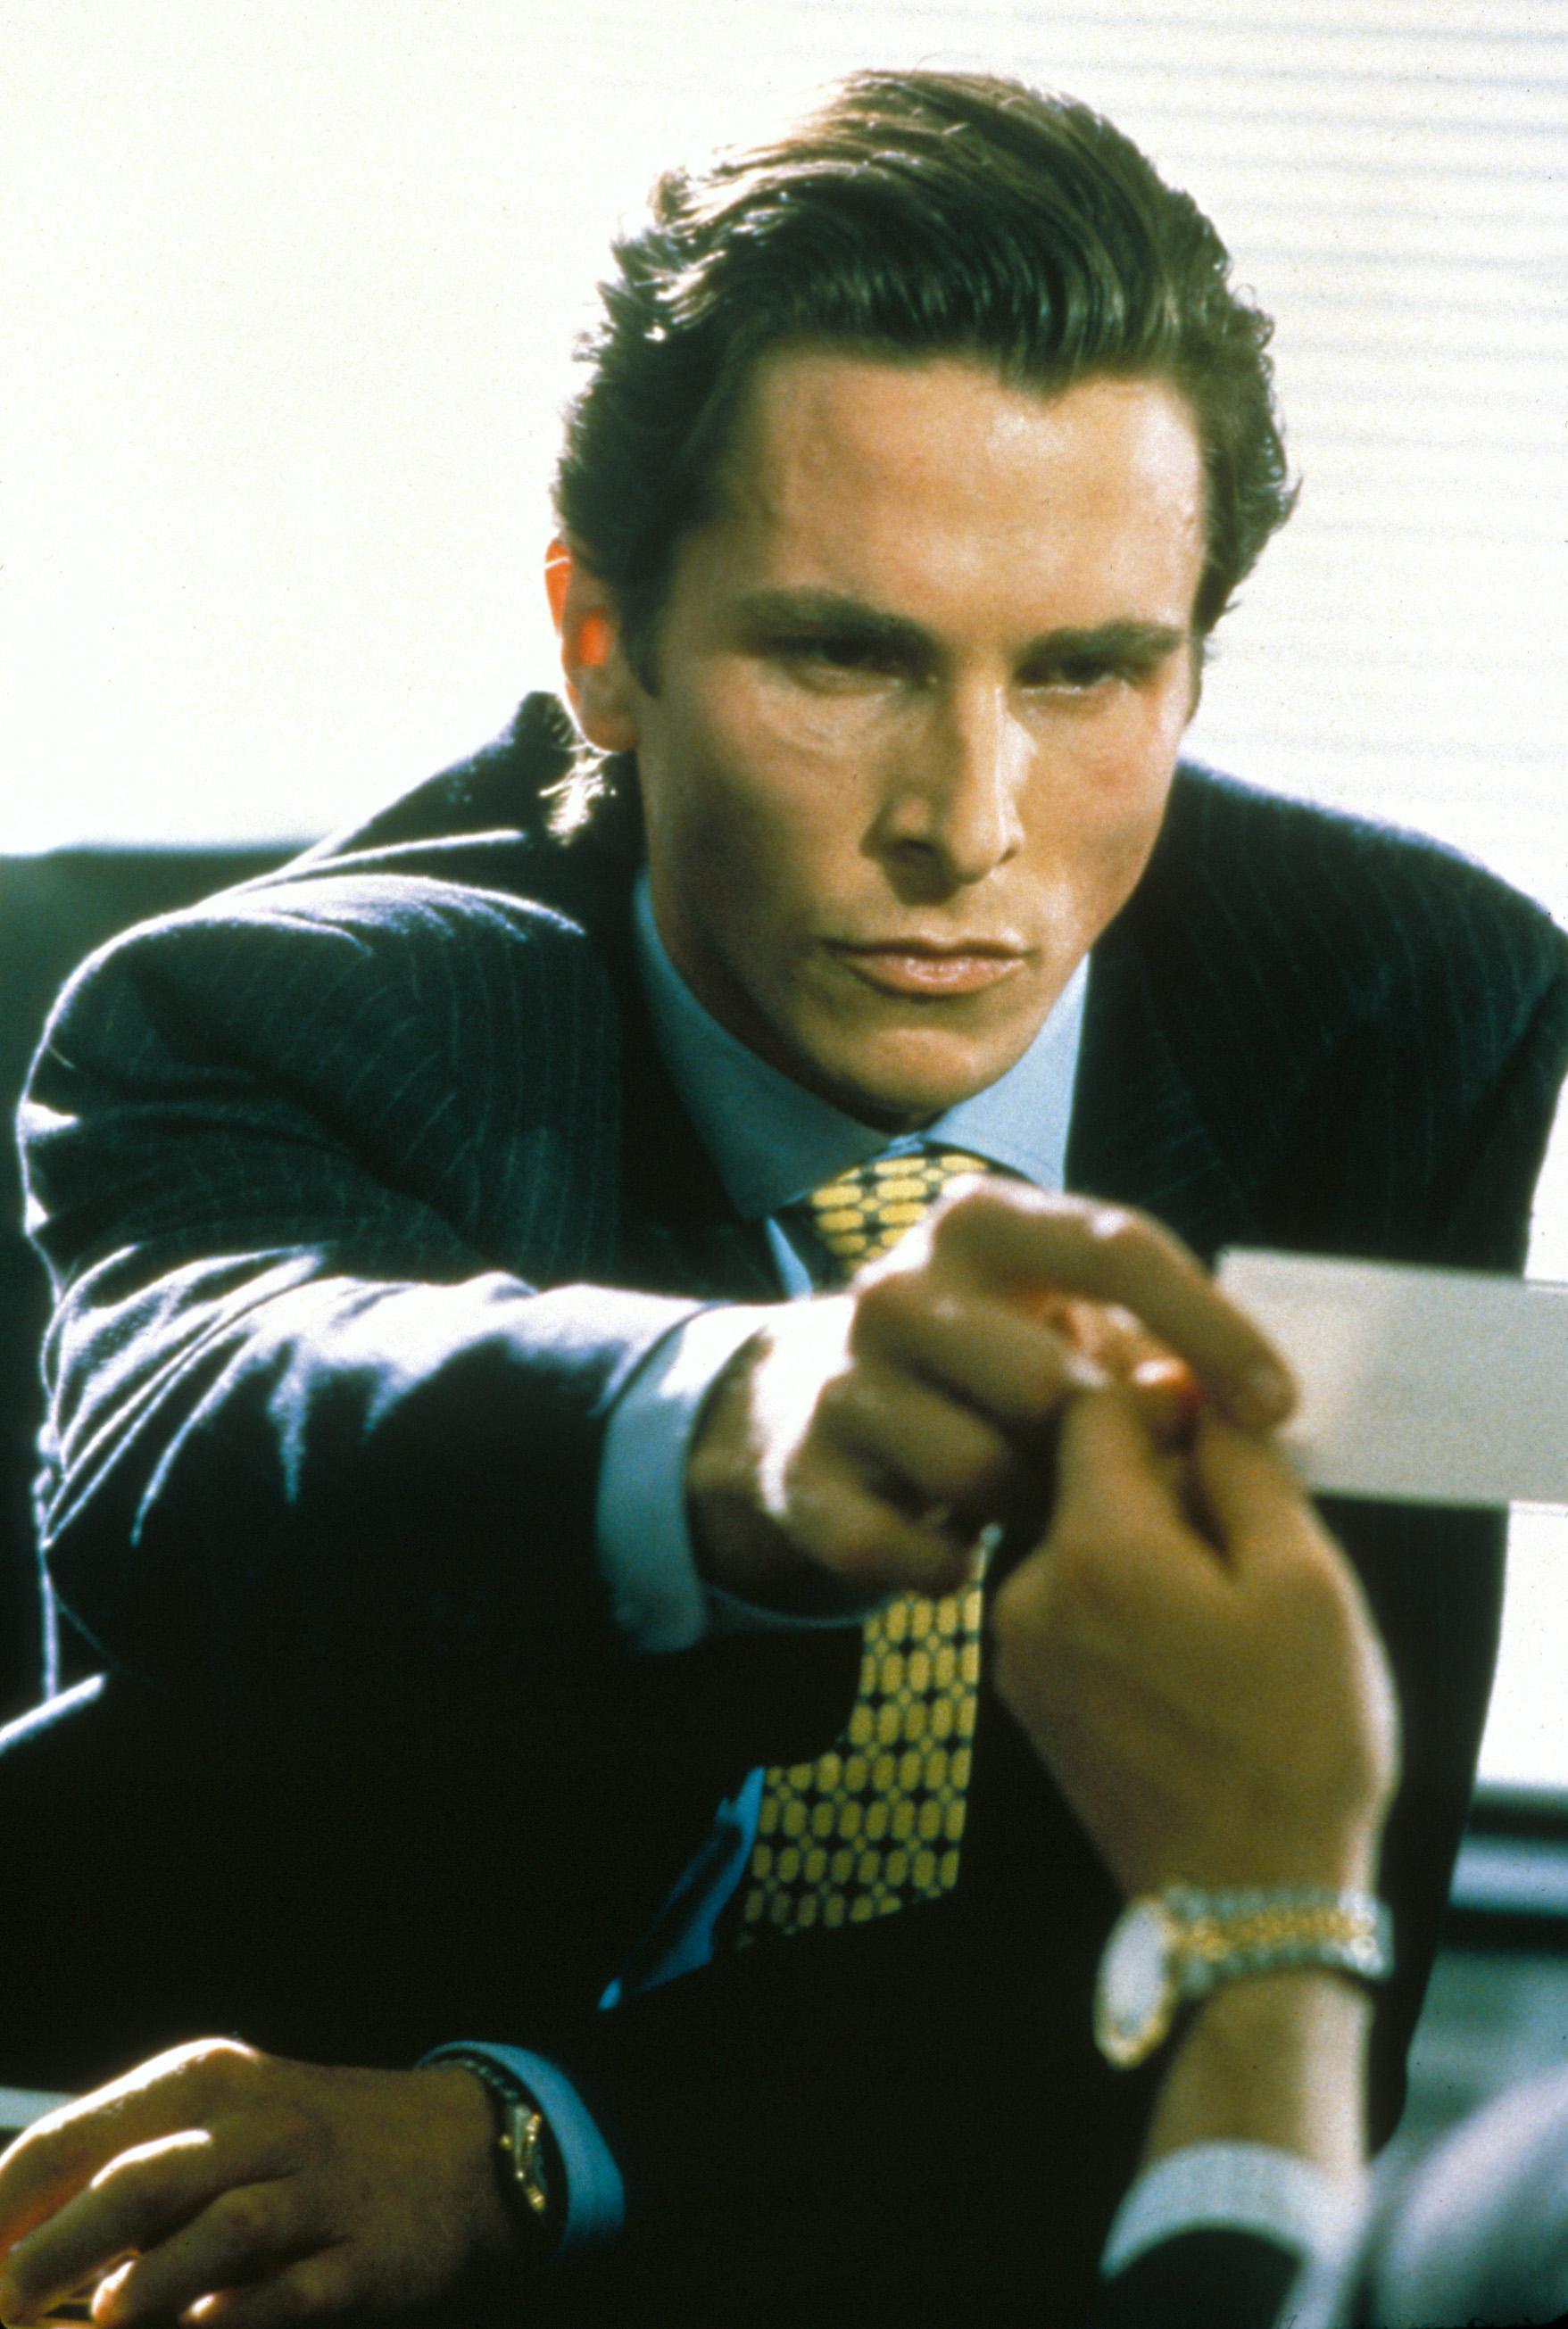 Christian Bale American Psycho Haircut 9490447 Darkfallonlinefo